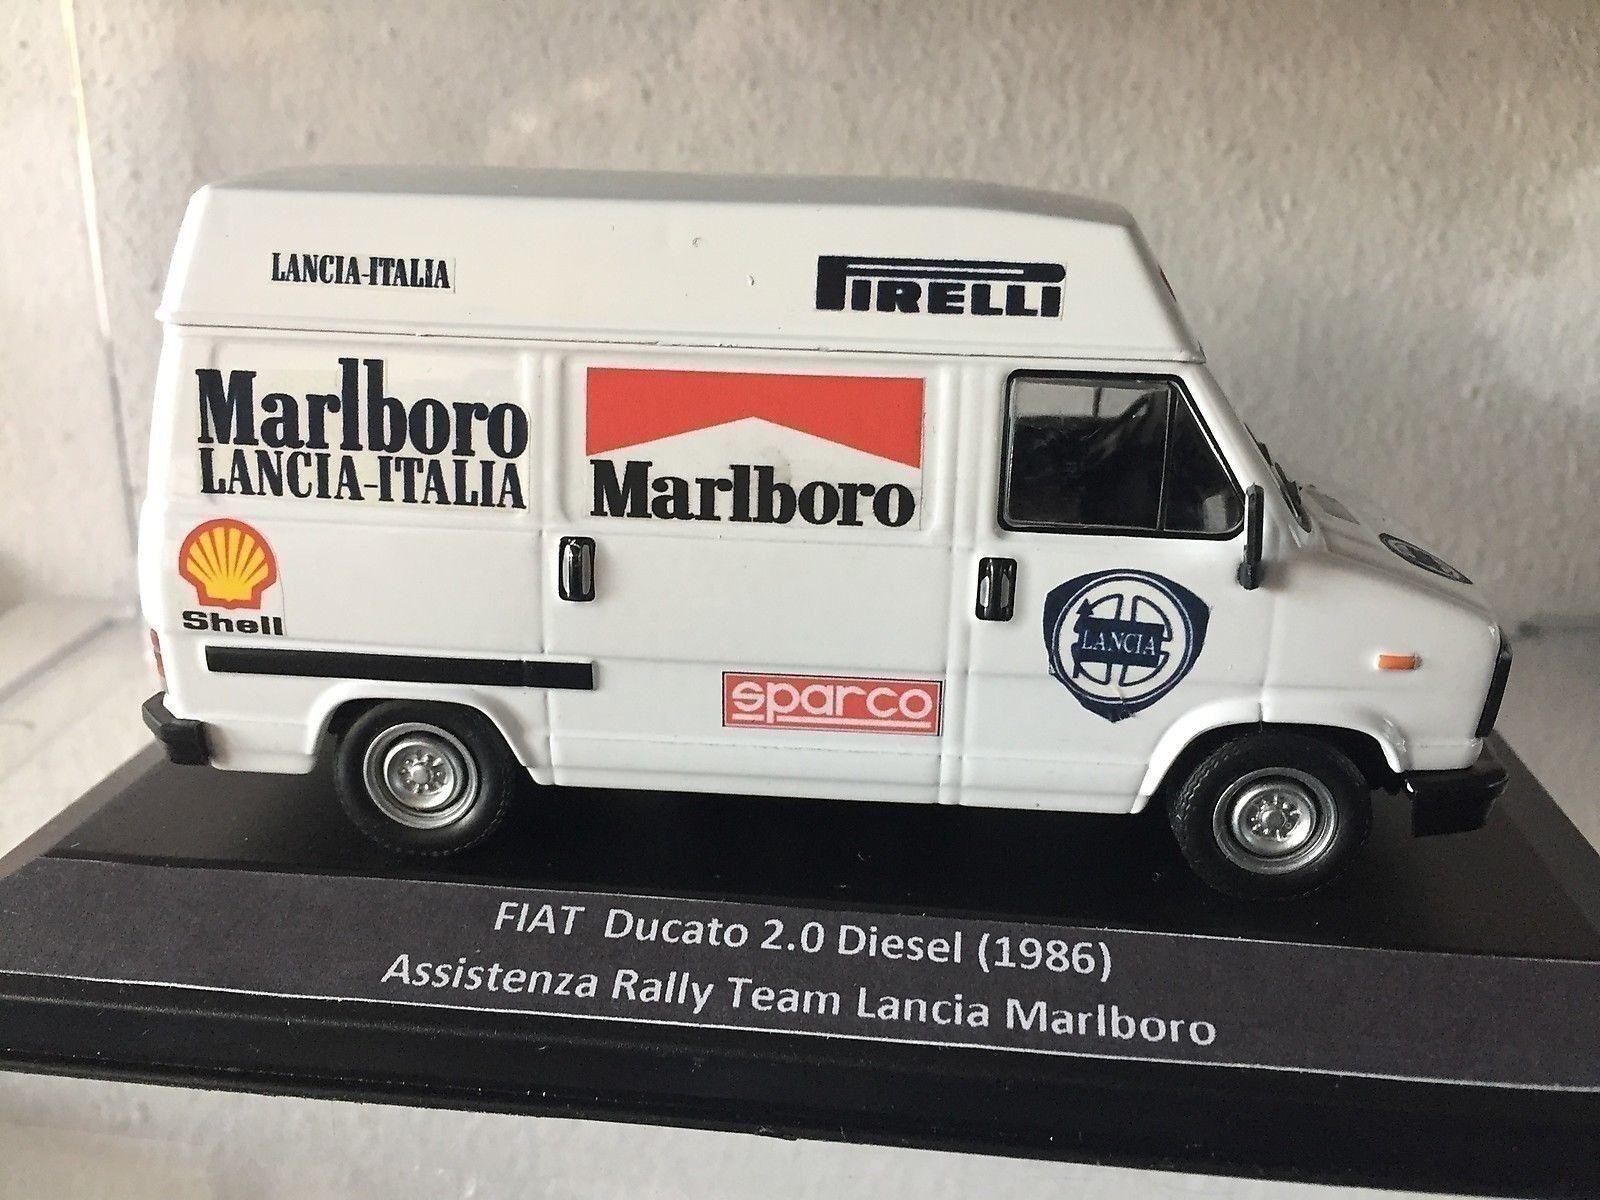 093 Fiat Ducato 2.0 Diesel 1986 Assistenza Rally Team Marlbor DIE CAST 1 43